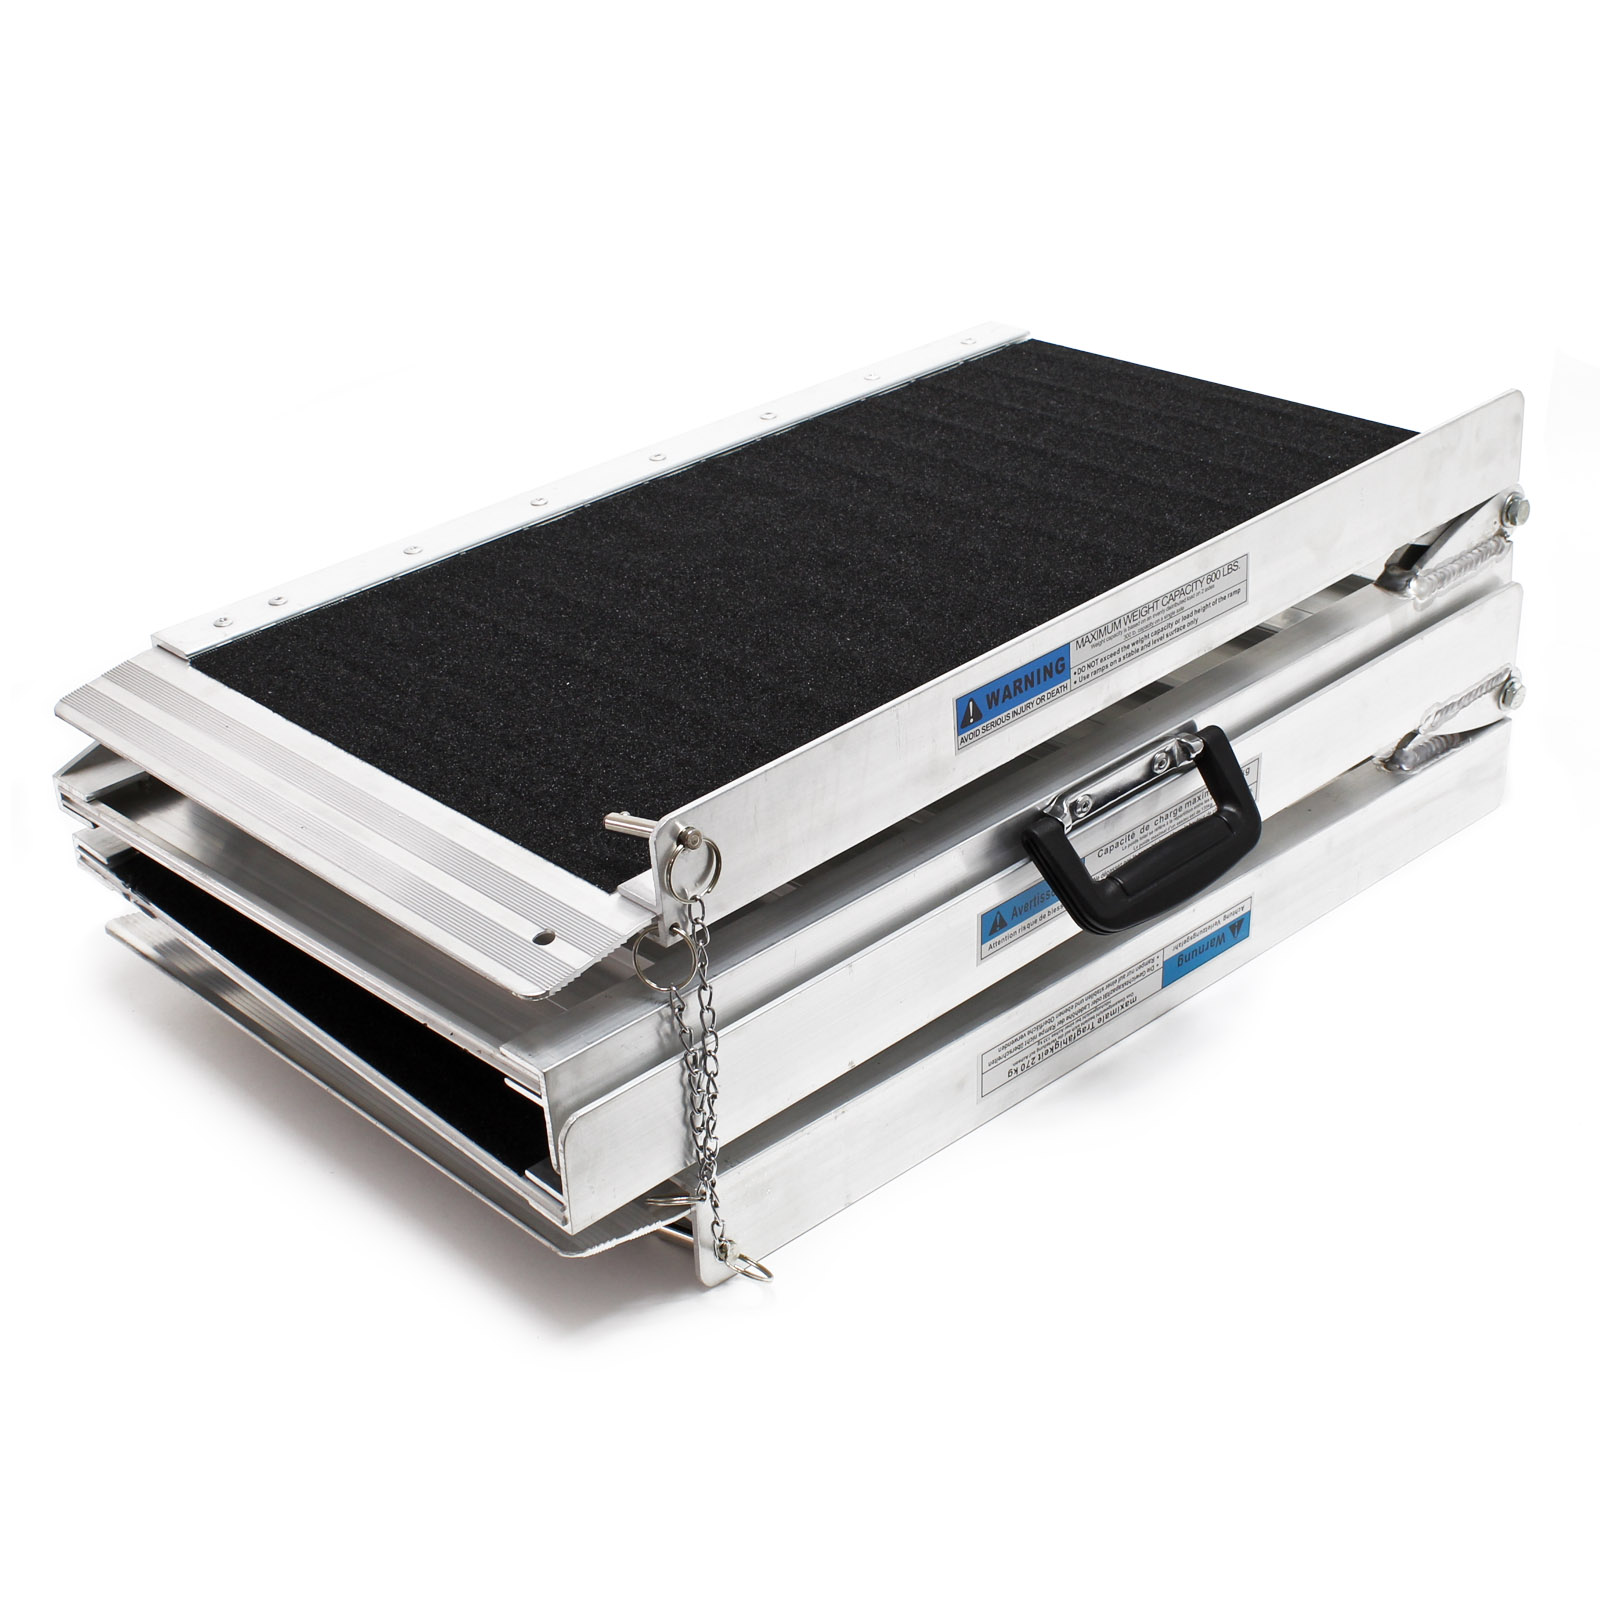 verschiedene varianten rollstuhlrampe aluminium rutschfest rampe rollstuhl mobil ebay. Black Bedroom Furniture Sets. Home Design Ideas